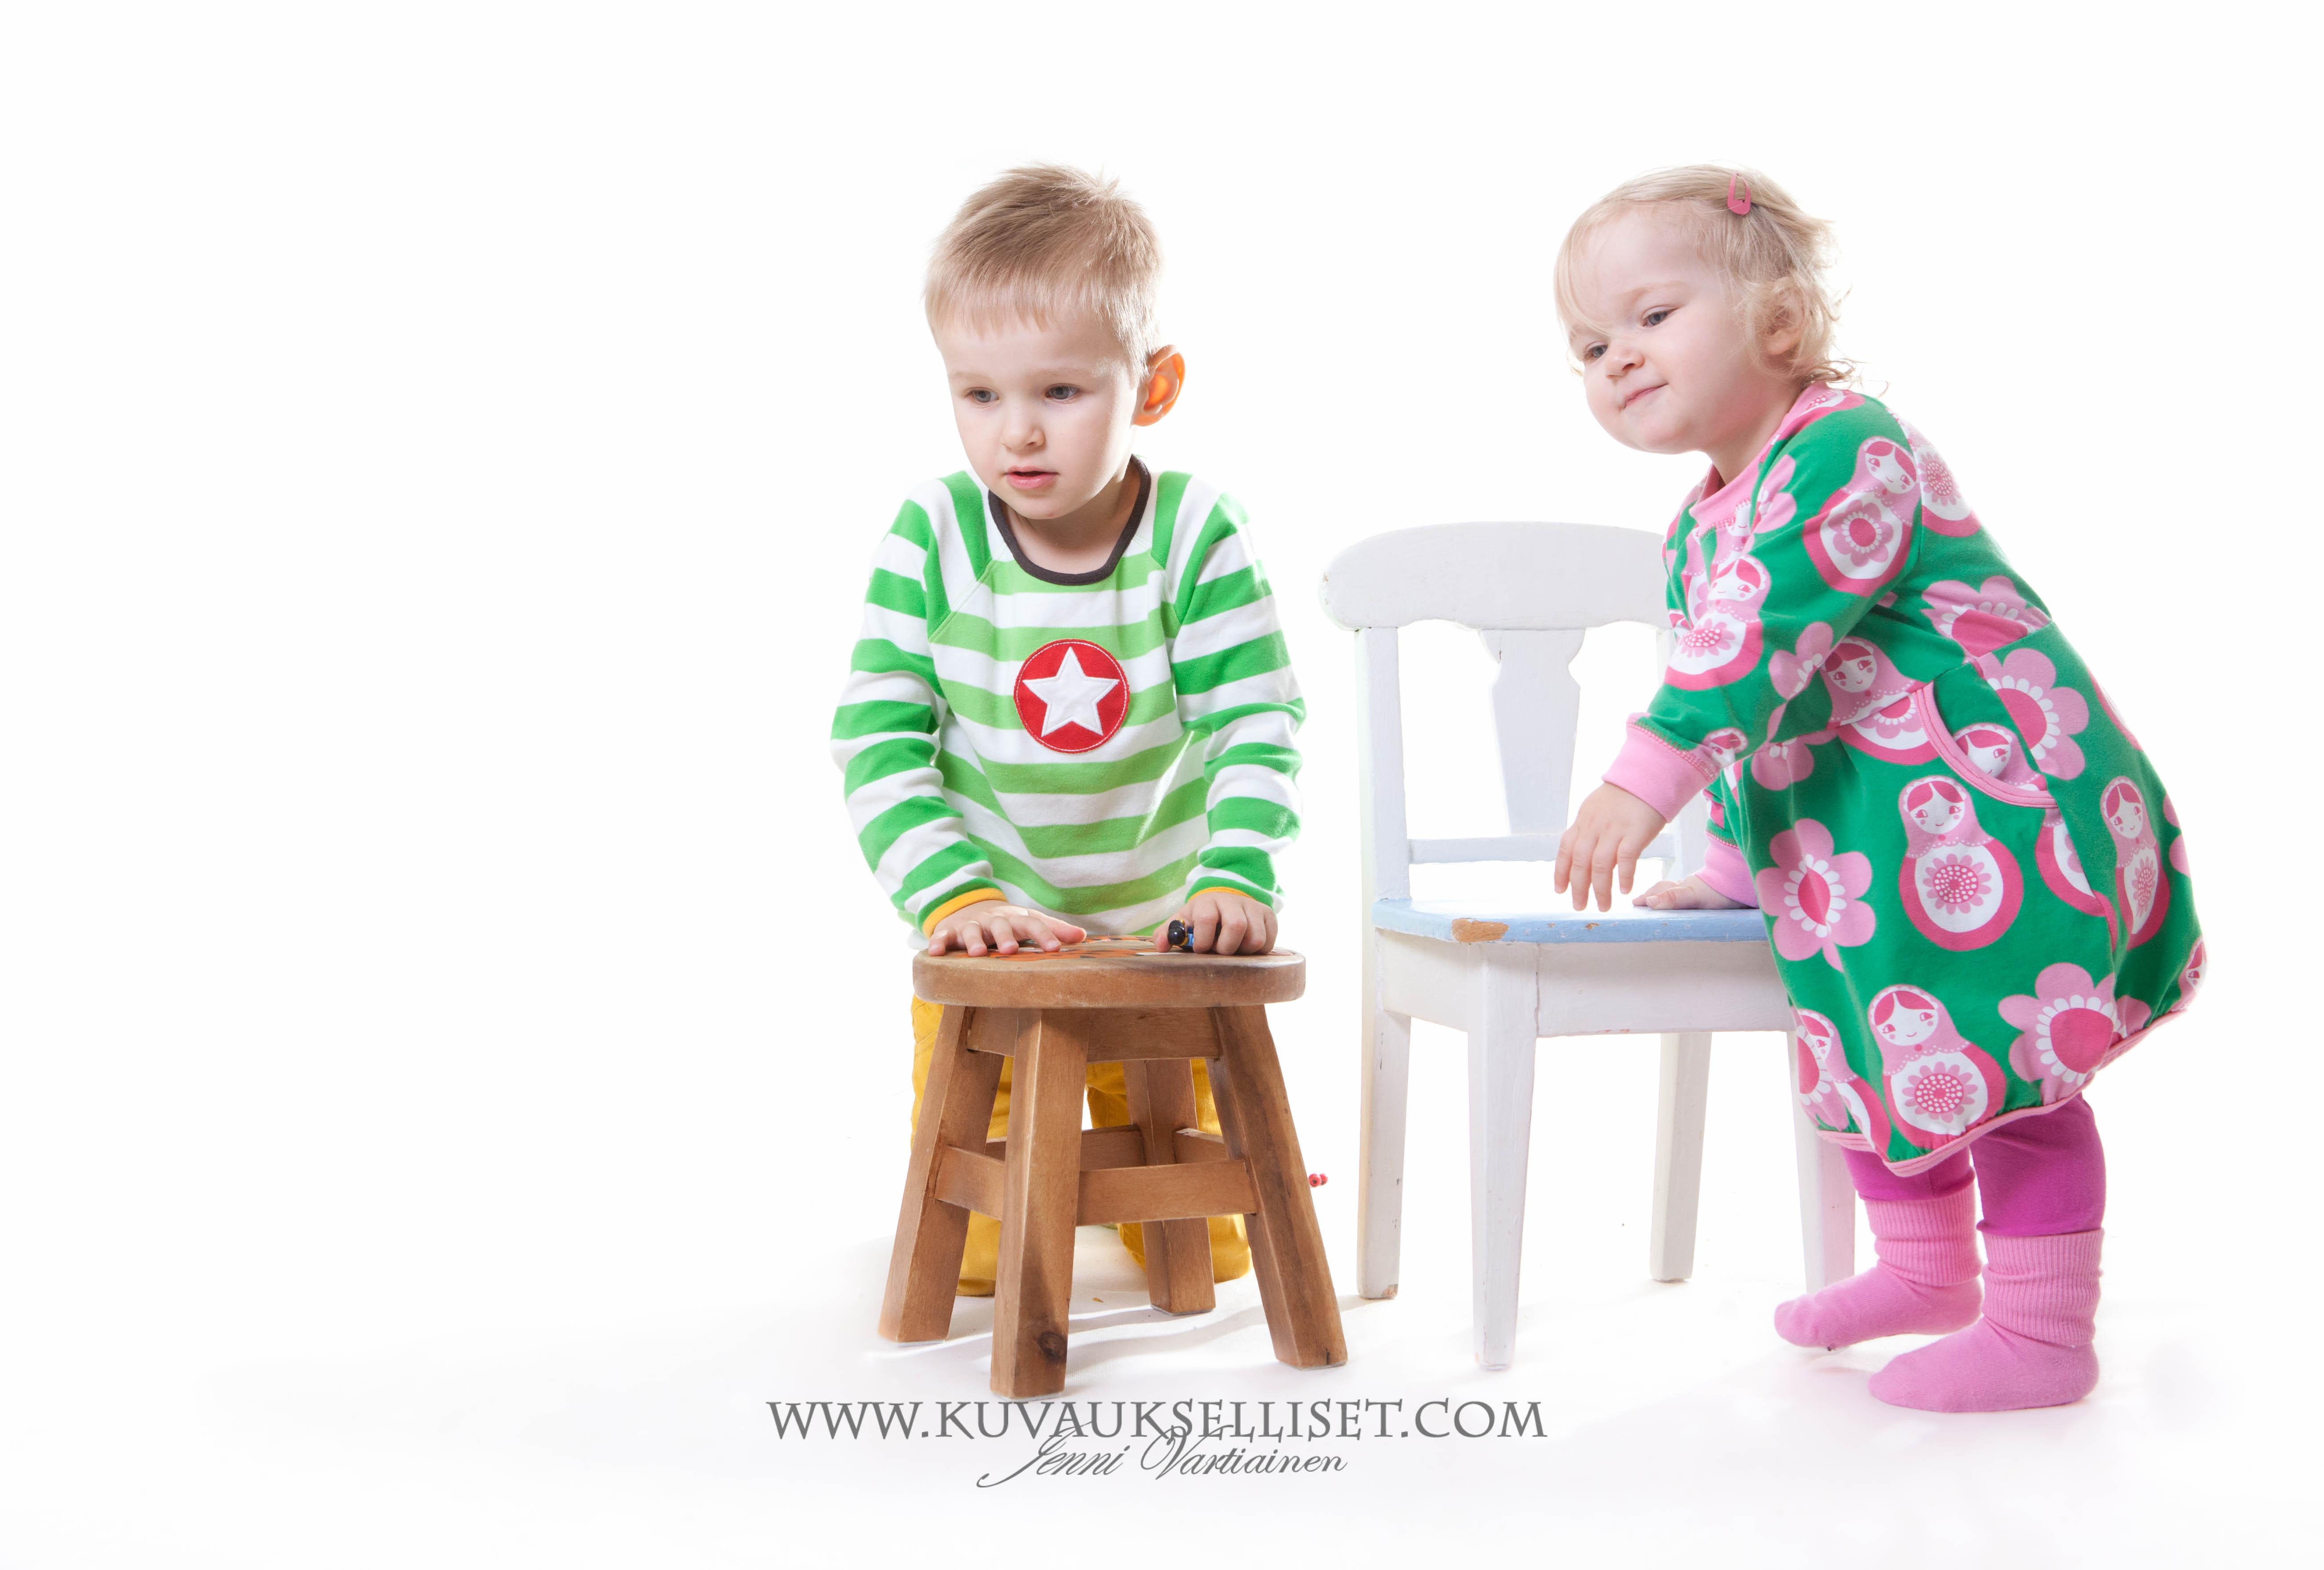 2014.10.19 Perhekuvaus lapsikuvaus studiokuvaus sisaruskuvaus 1-vuotiskuvaus muotokuva-7